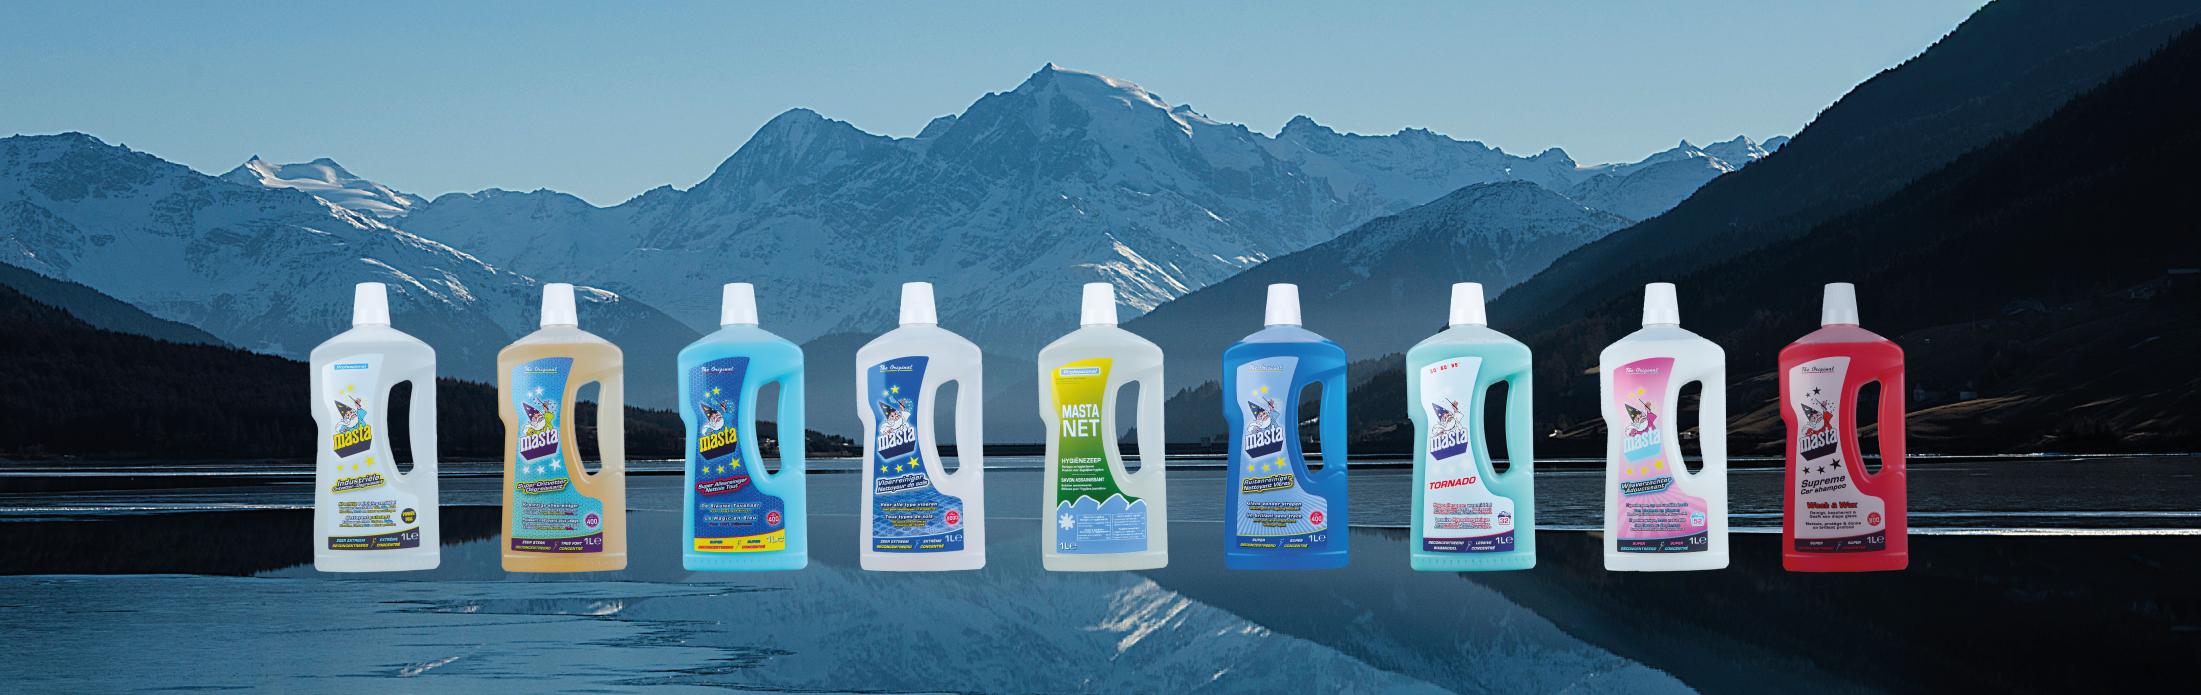 Masta website Achtergrond producten kuisen reinigen